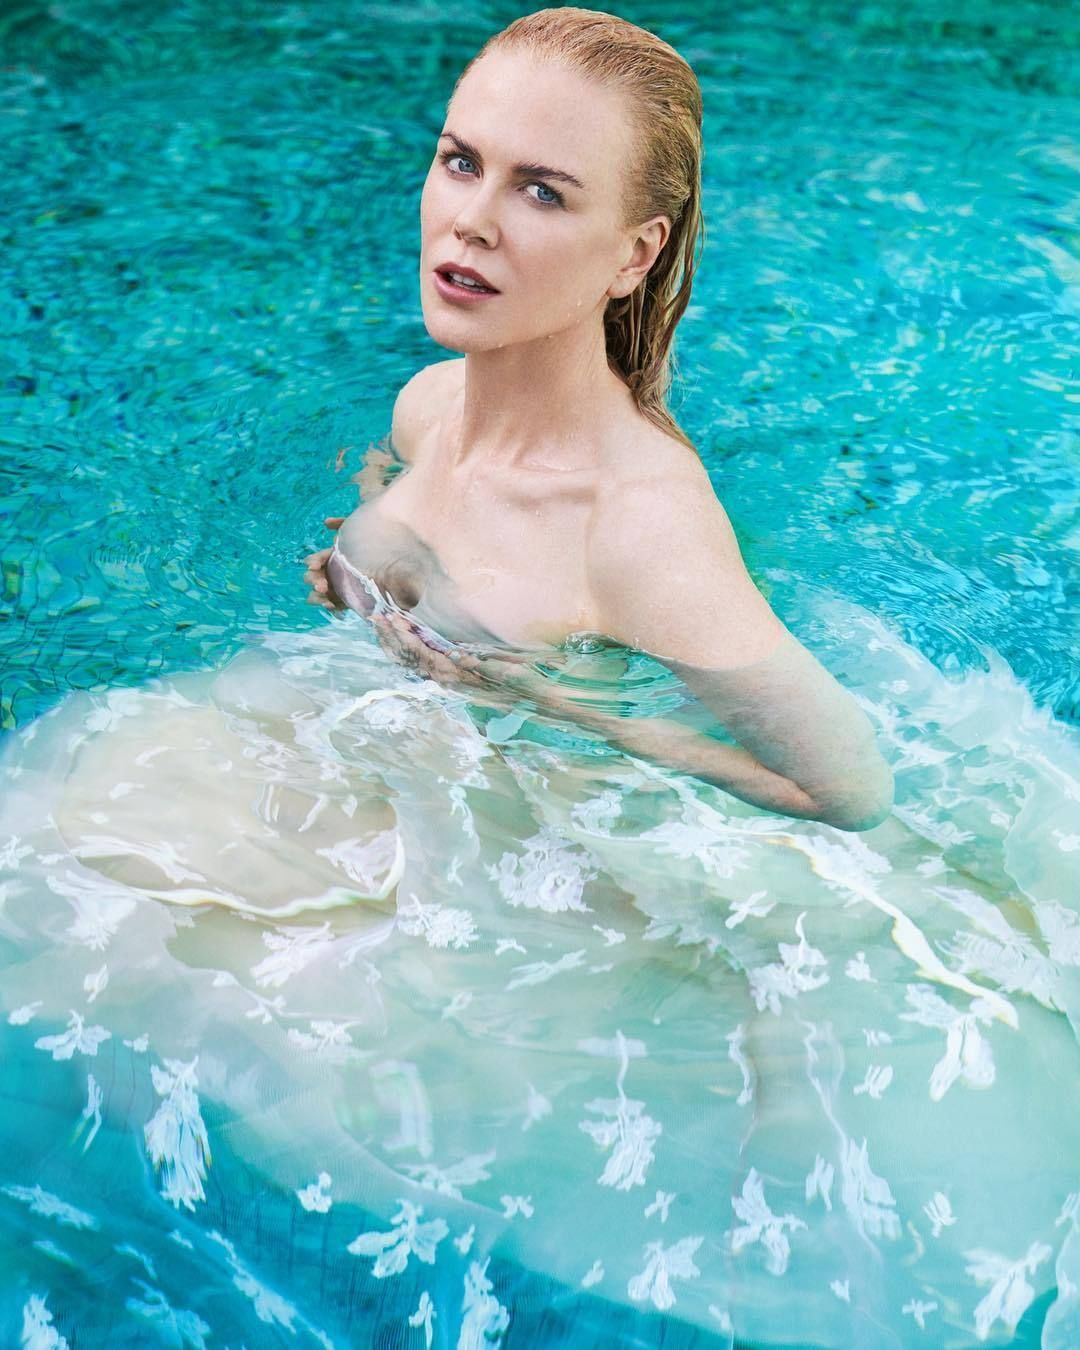 Фотосессия Фотосессия Nicole Kidman (Stellar, август 2017)